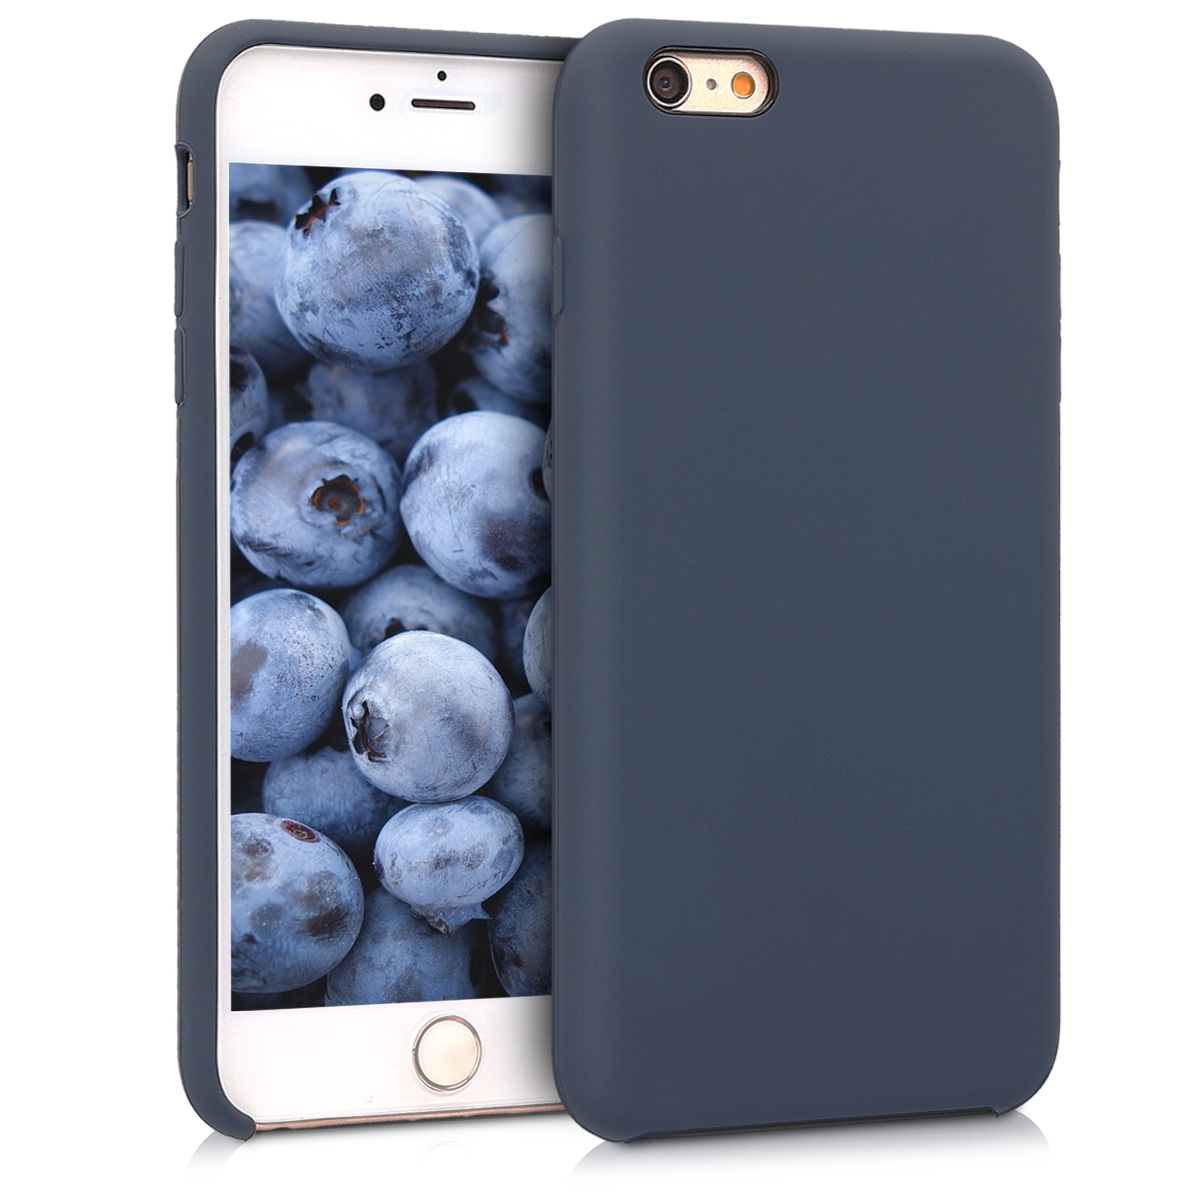 Kvalitní silikonové TPU pouzdro pro Apple iPhone 6 Plus / 6S - Dark Blue Matte